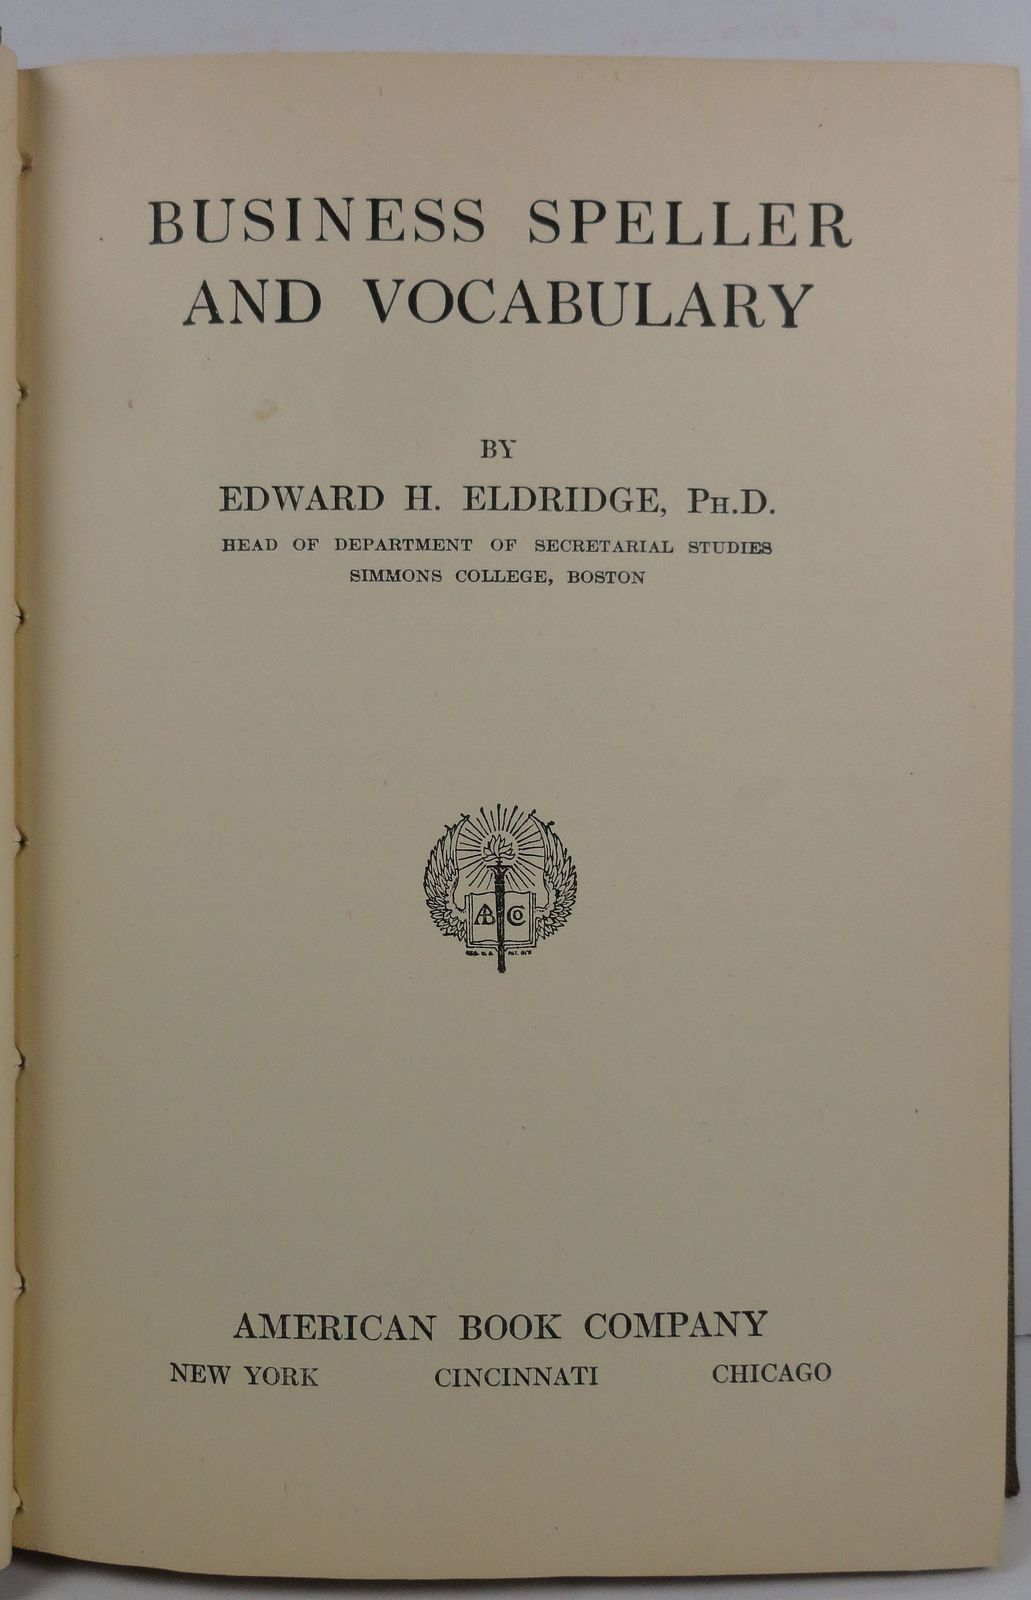 Business Speller and Vocabulary by Edward H. Eldridge 1913